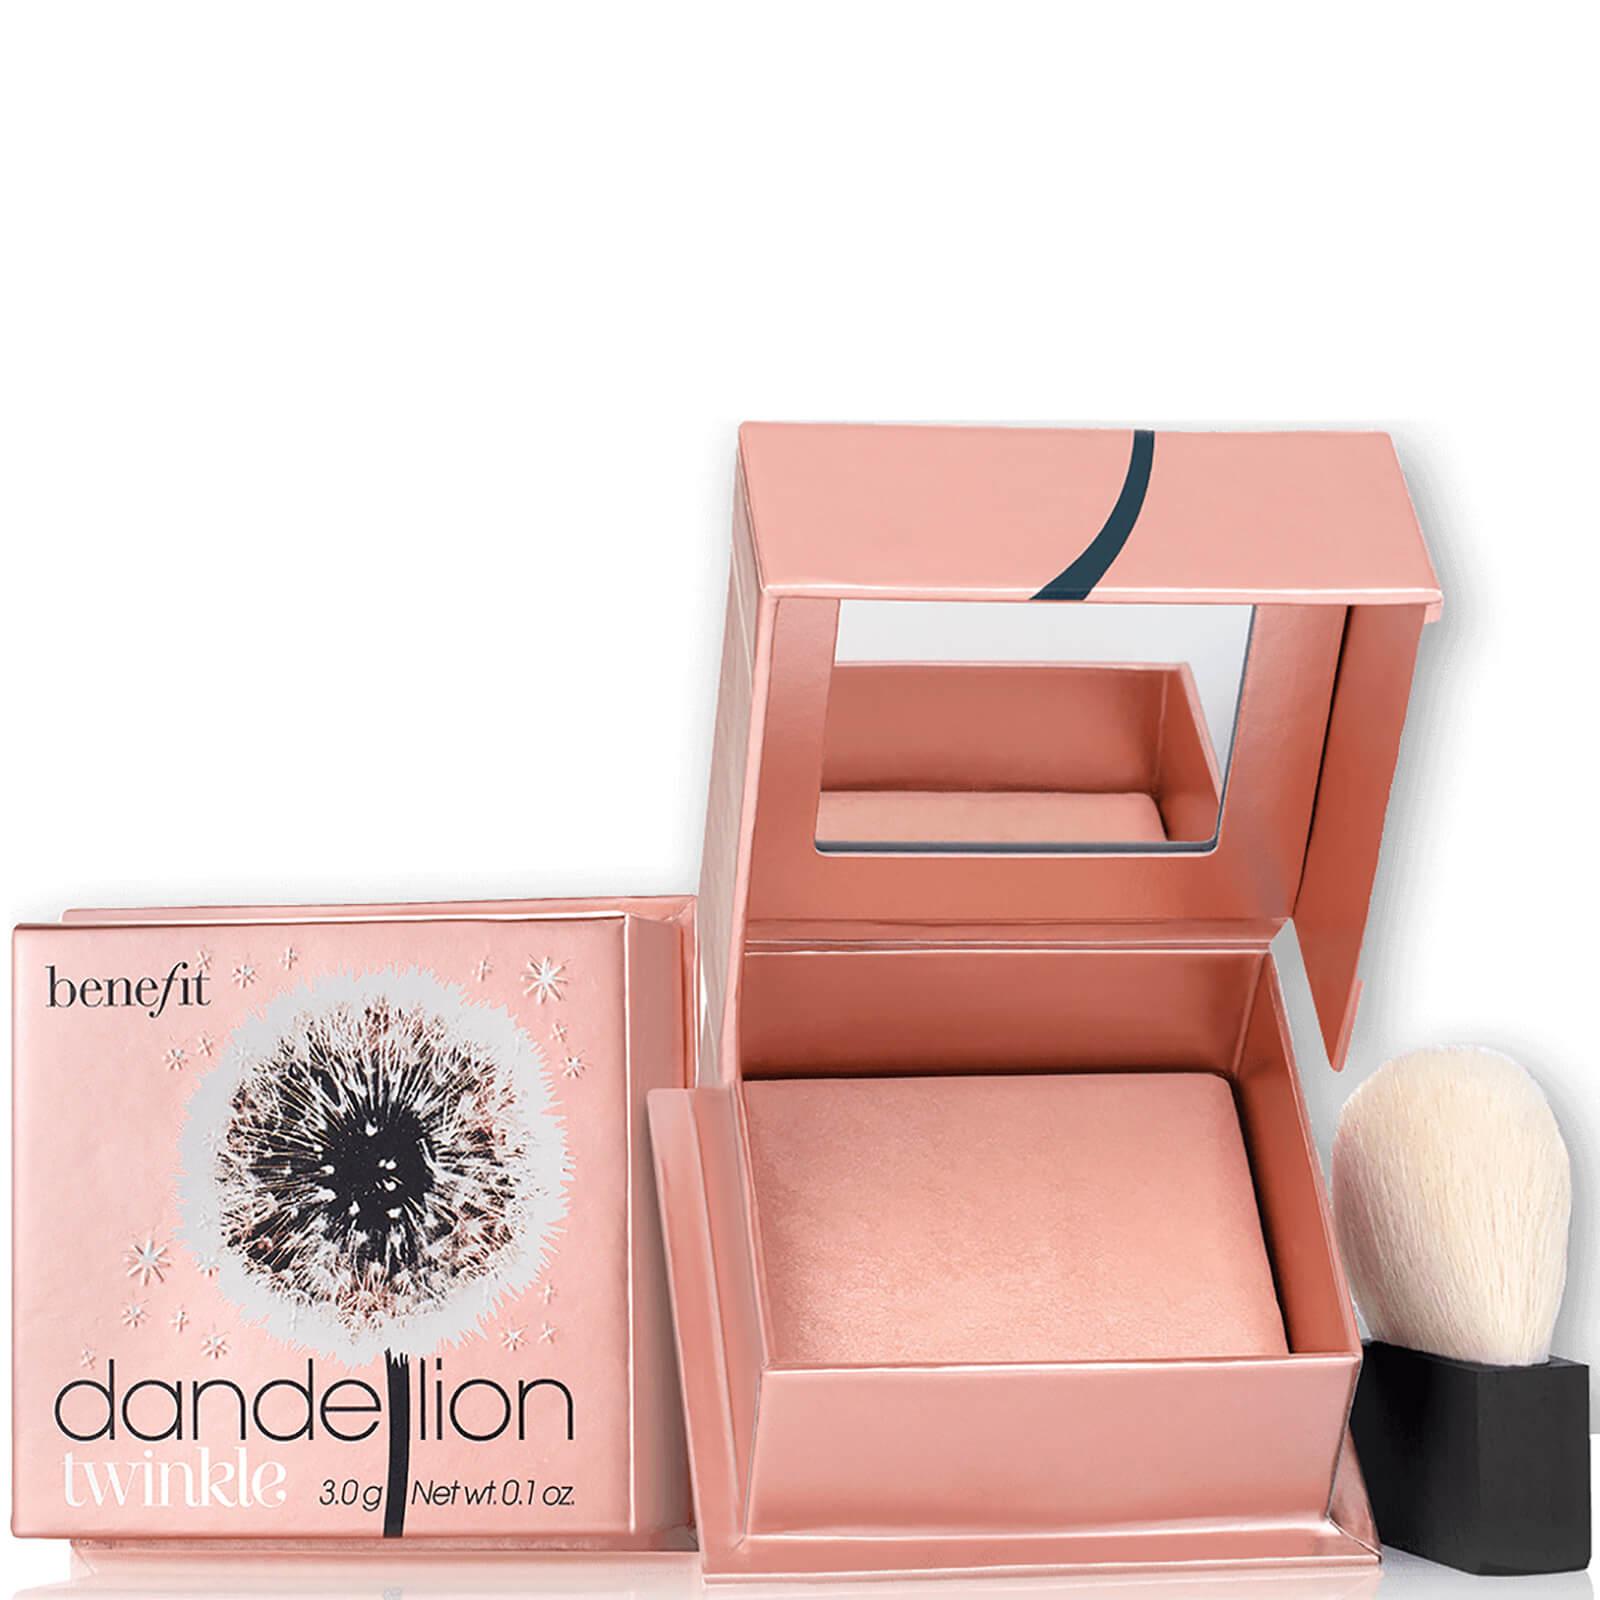 Benefit Dandelion Twinkle Powder Highlighter Free Shipping Ongkir Philips Dry Iron Hi 1172 Lookfantastic